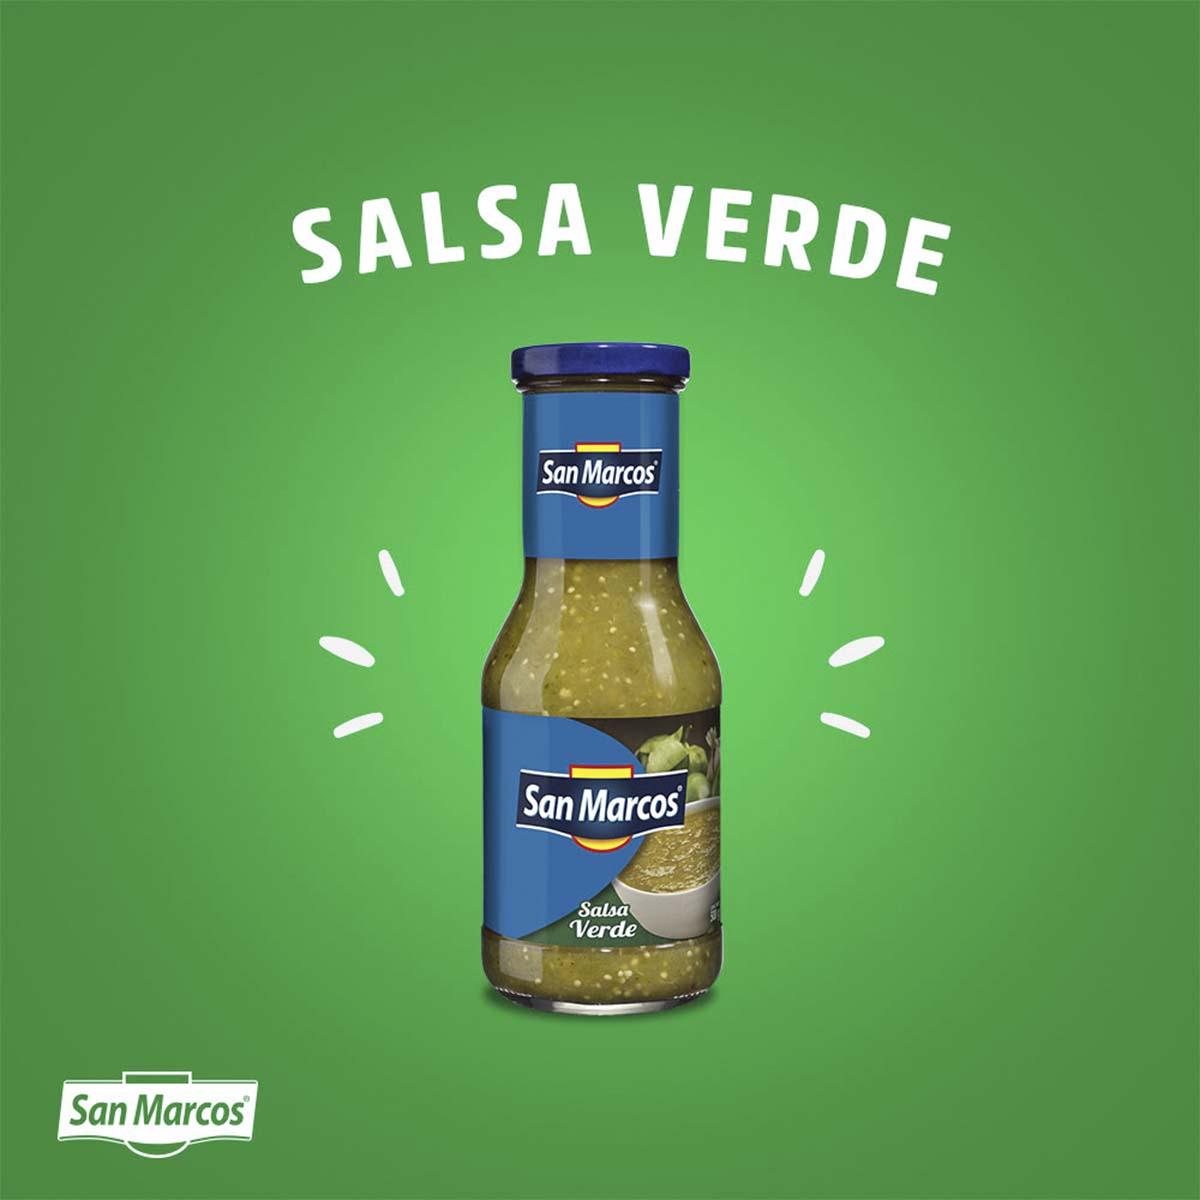 salsa verde photo